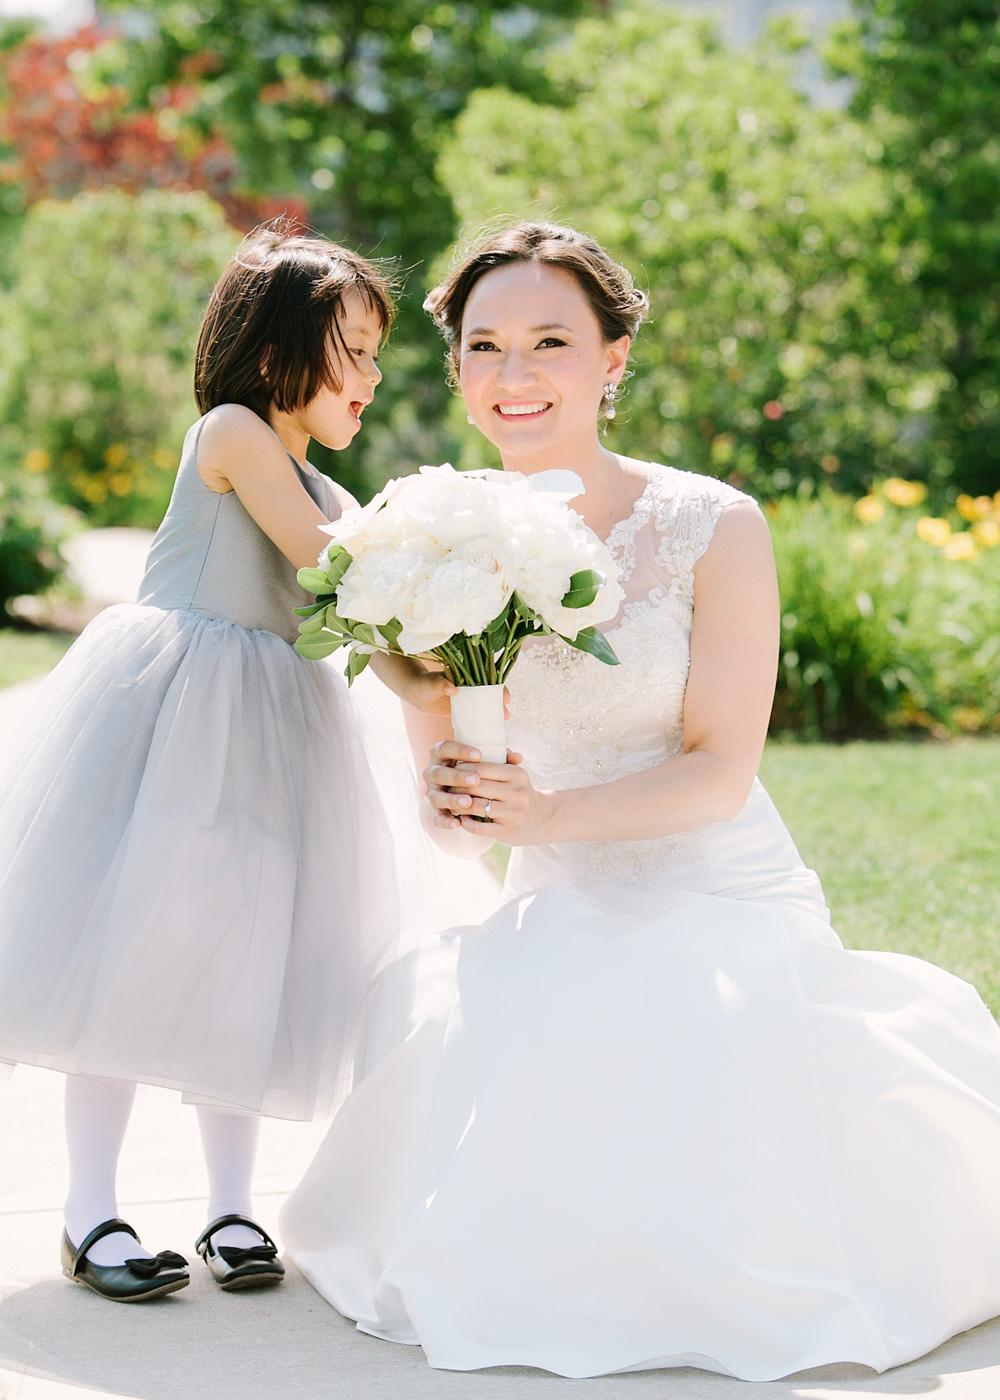 Wedding_photography_by_Tanya_Isaeva-53.jpg